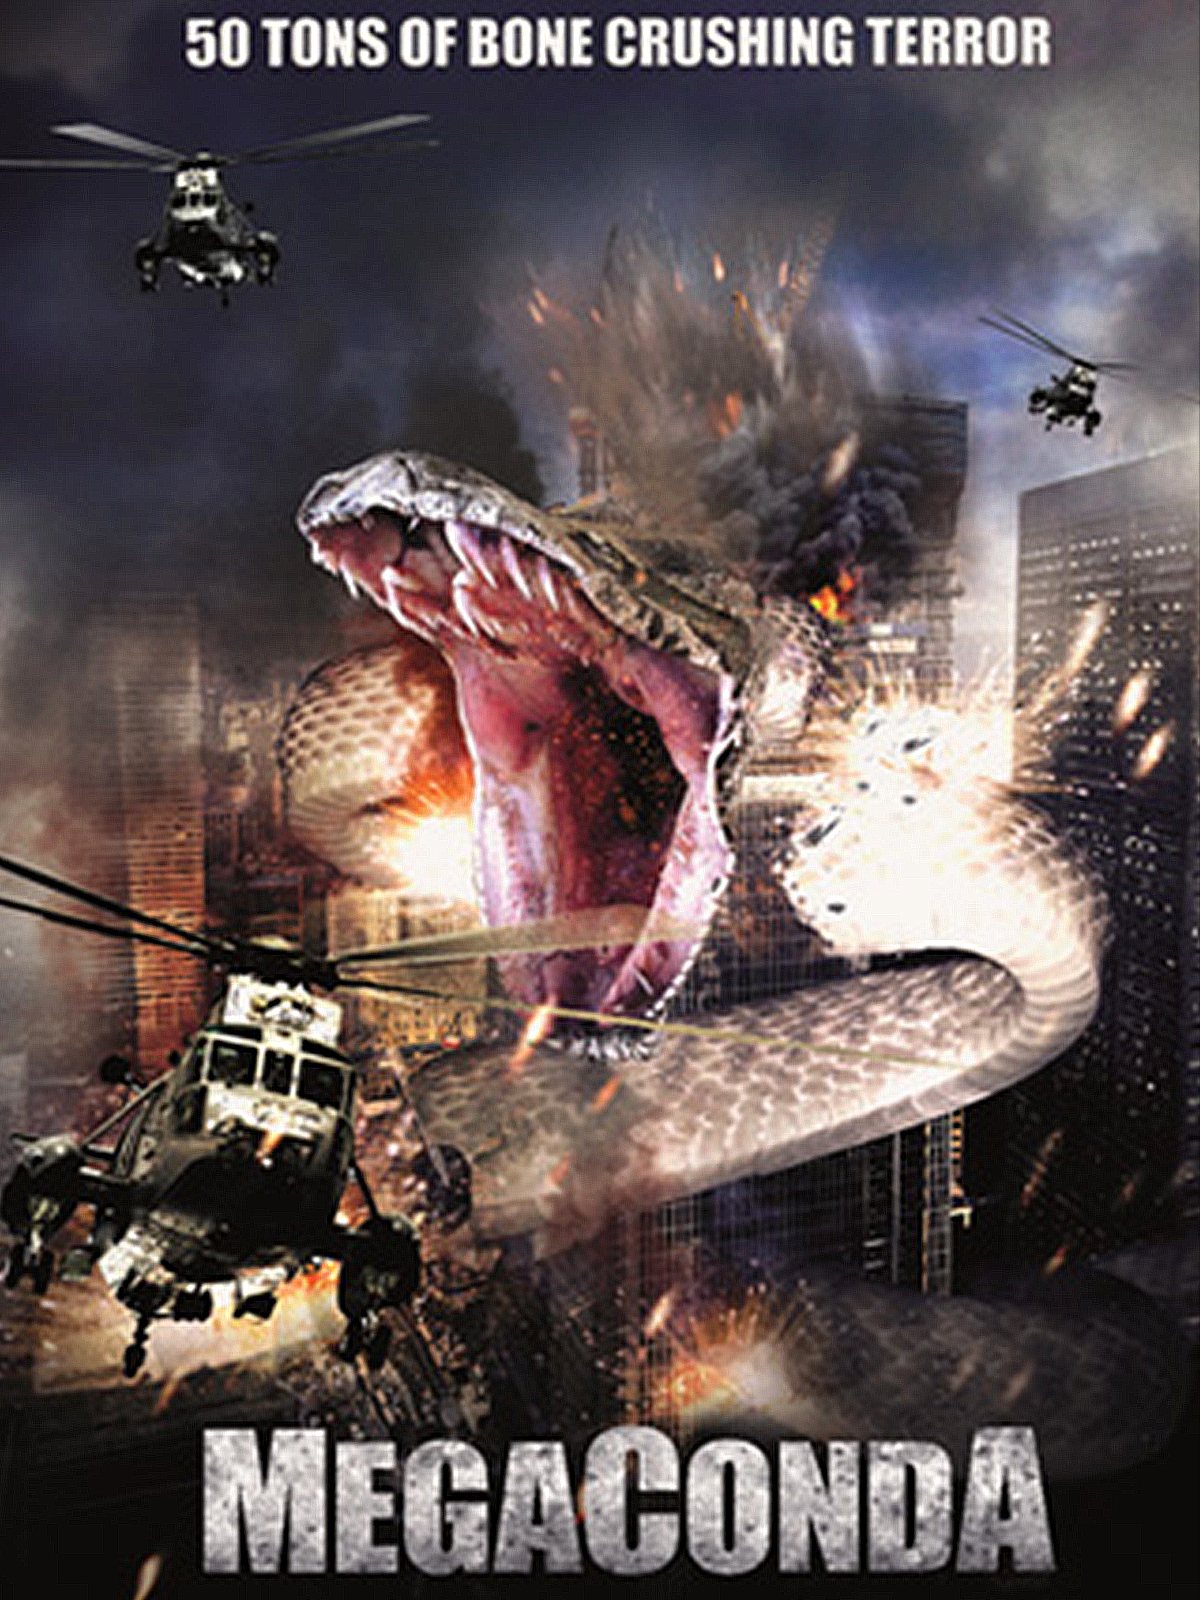 Here-Megaconda-Full-Image-en-US.jpg